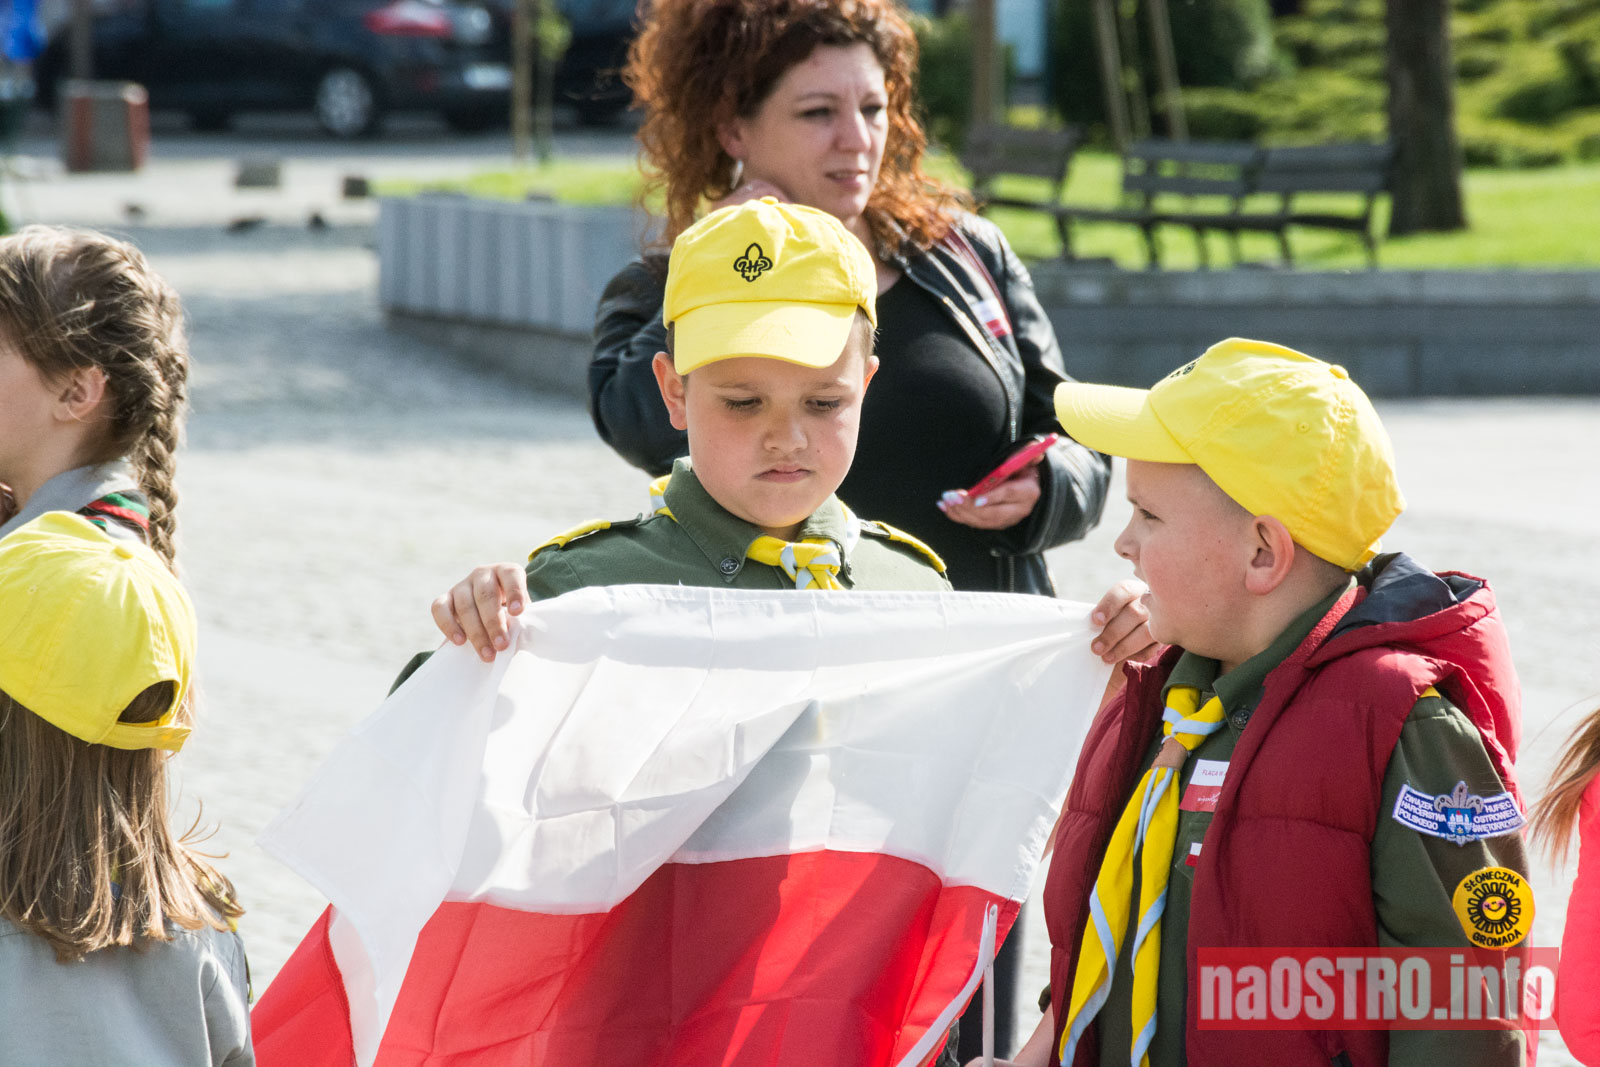 NaOSTRO dzien flagi rynek-9